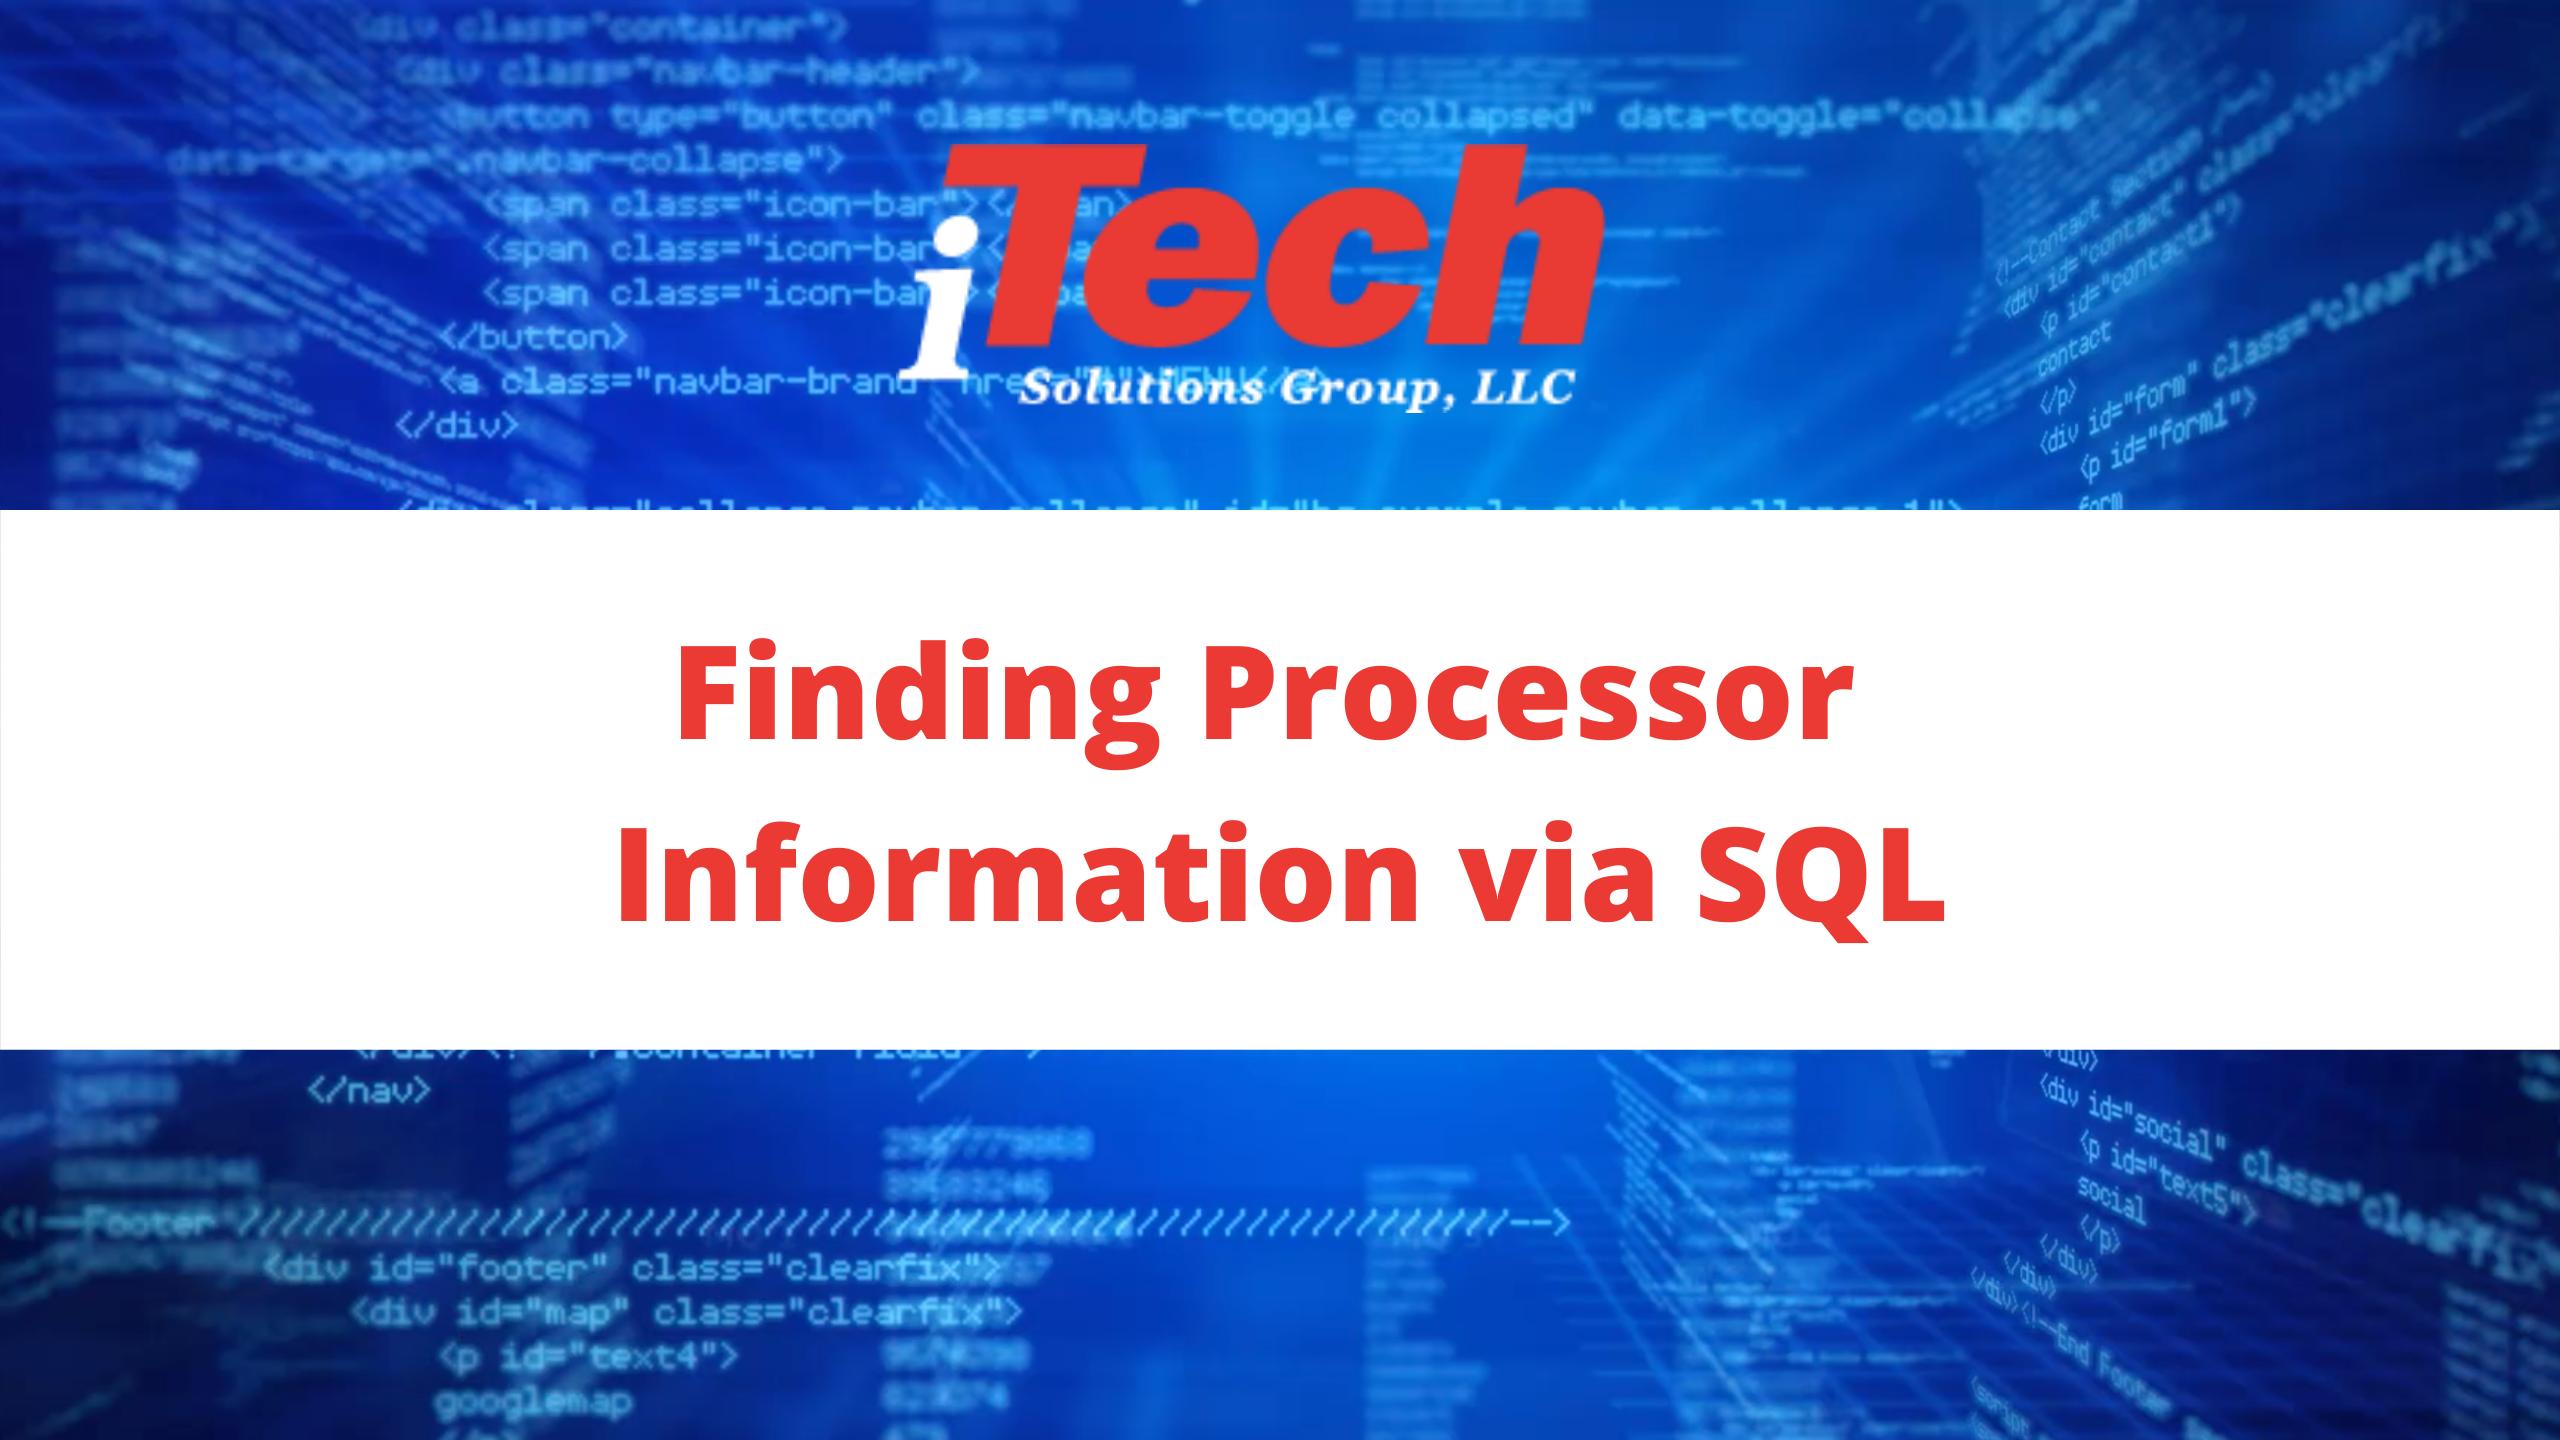 Finding Processor Information via SQL